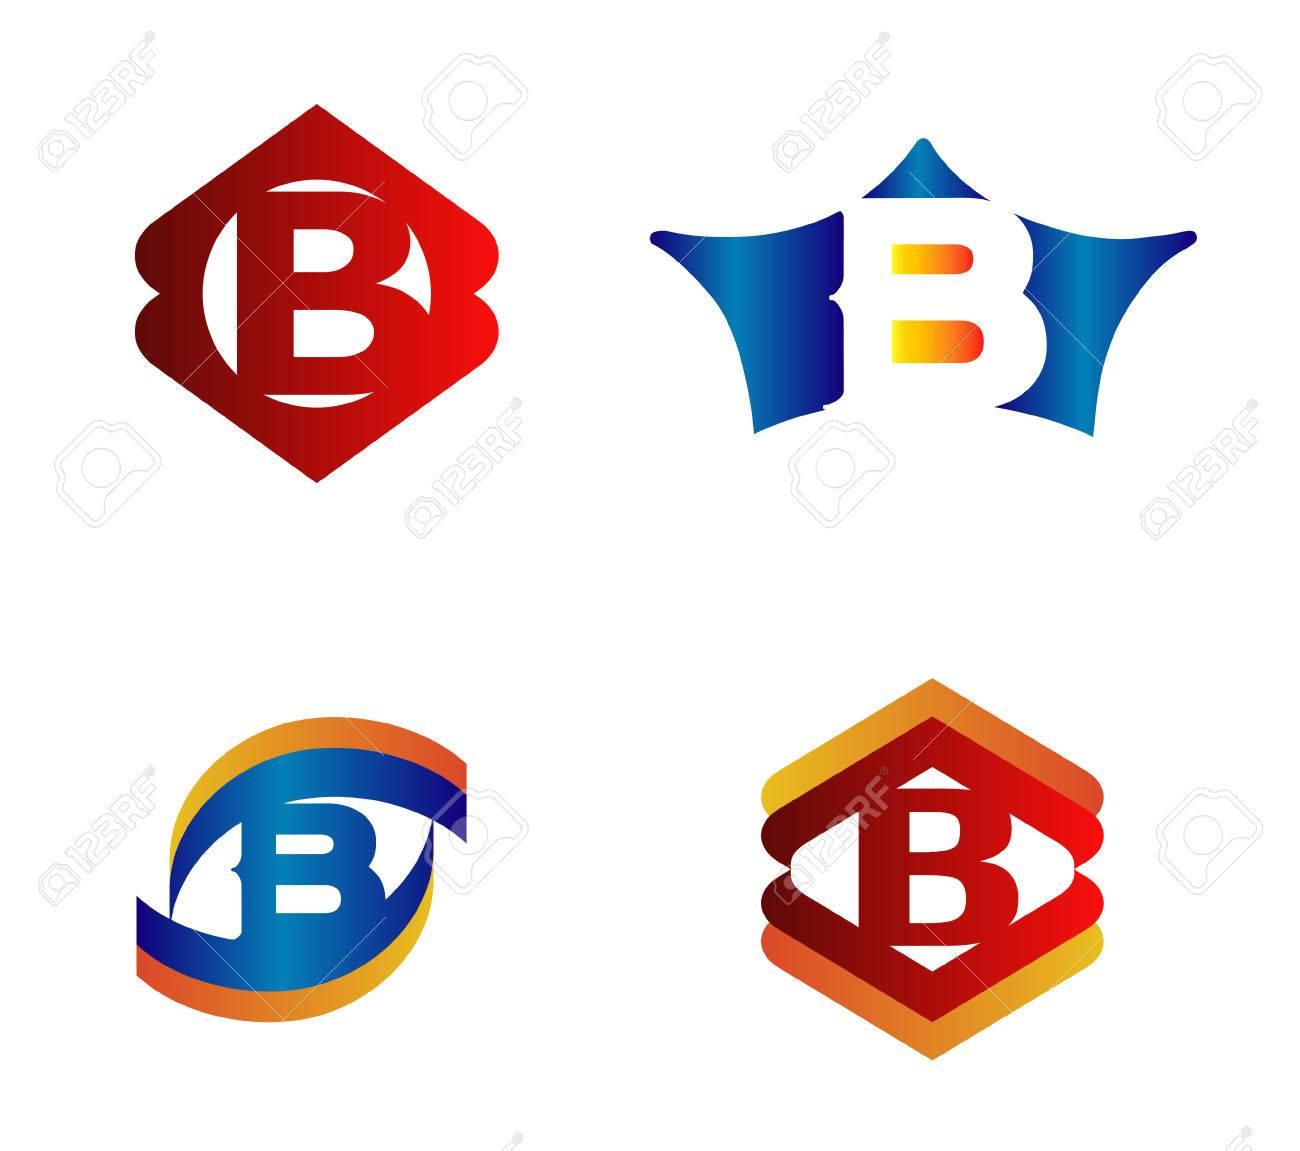 alphabetical logo design stock photos images royalty alphabetical logo design letter b logo design concepts set alphabetical